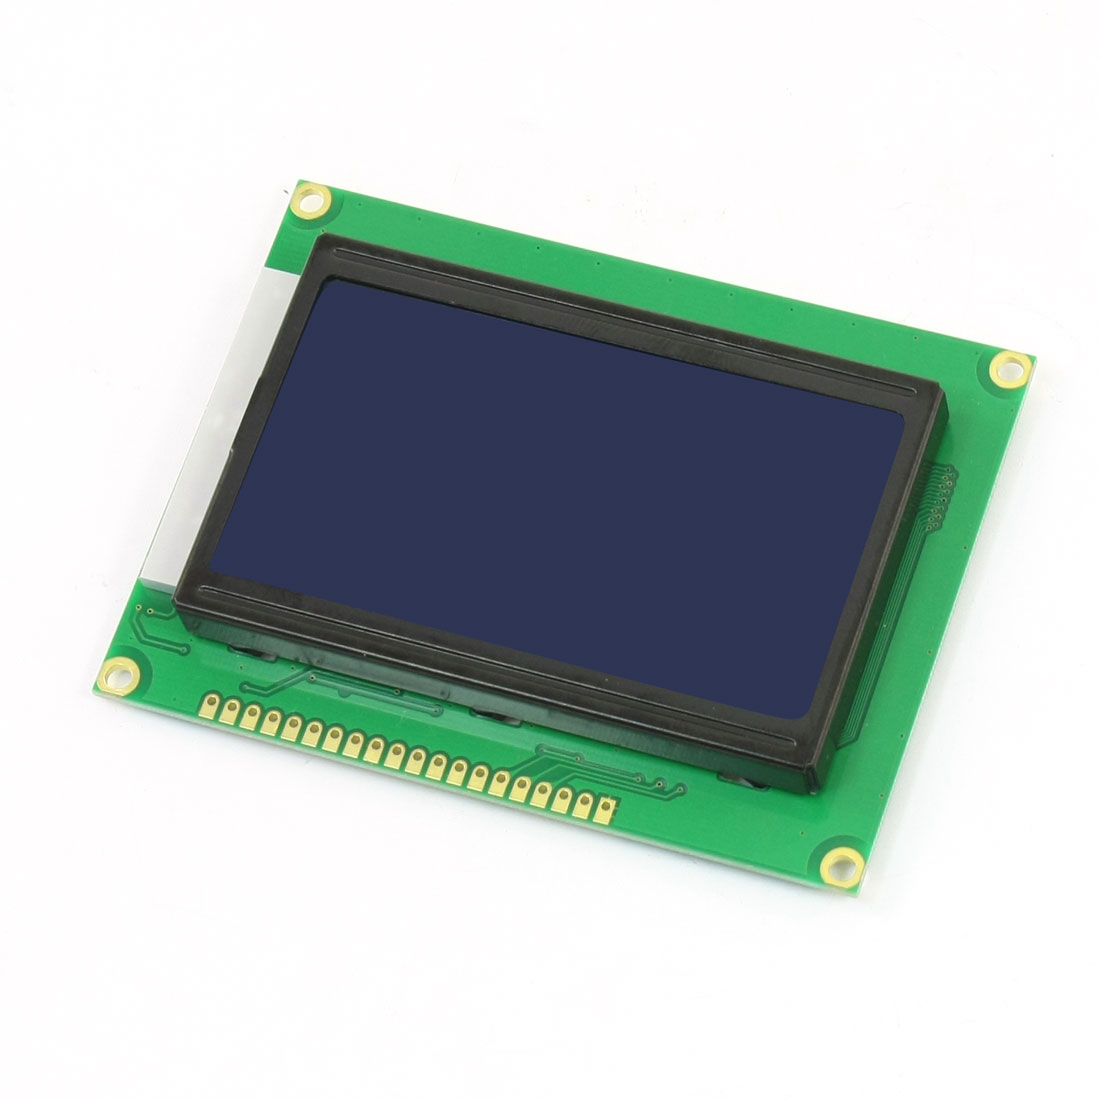 5V LCD12864 128 x 64 LCD Display Blue Screen Module LCM w Backlight